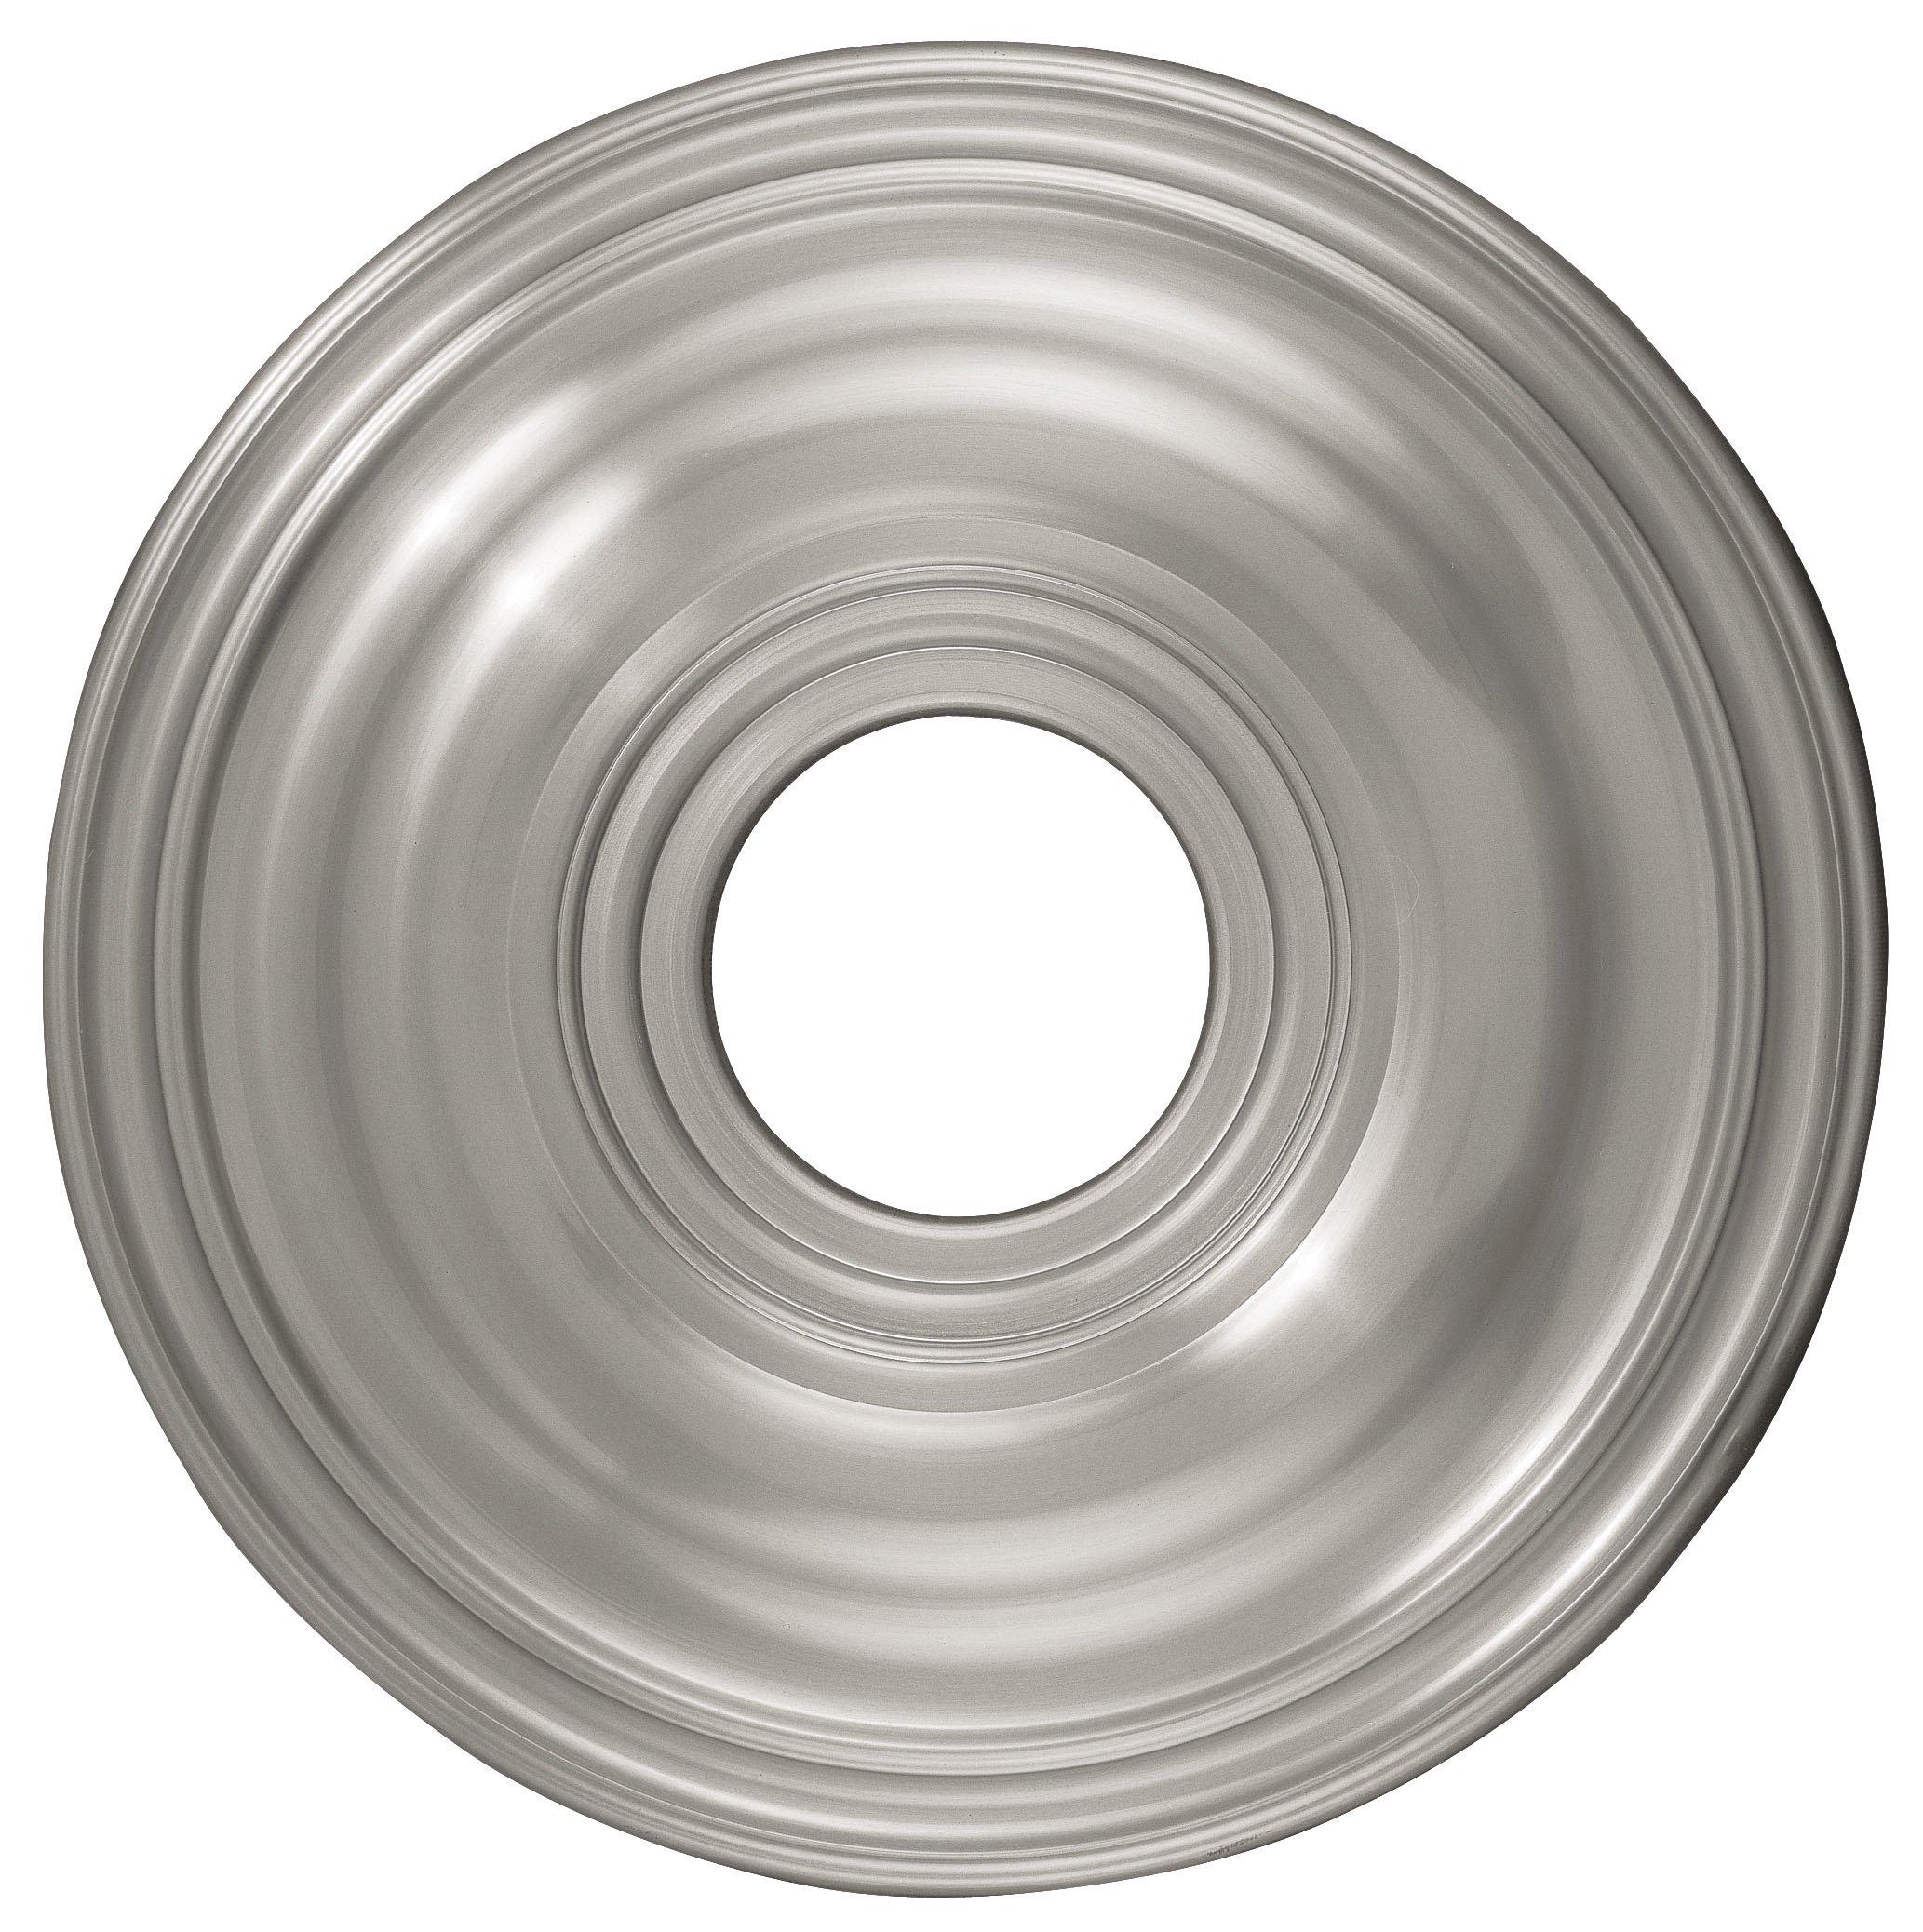 Livex Lighting 8217-91 Ceiling Medallion, Brushed Nickel